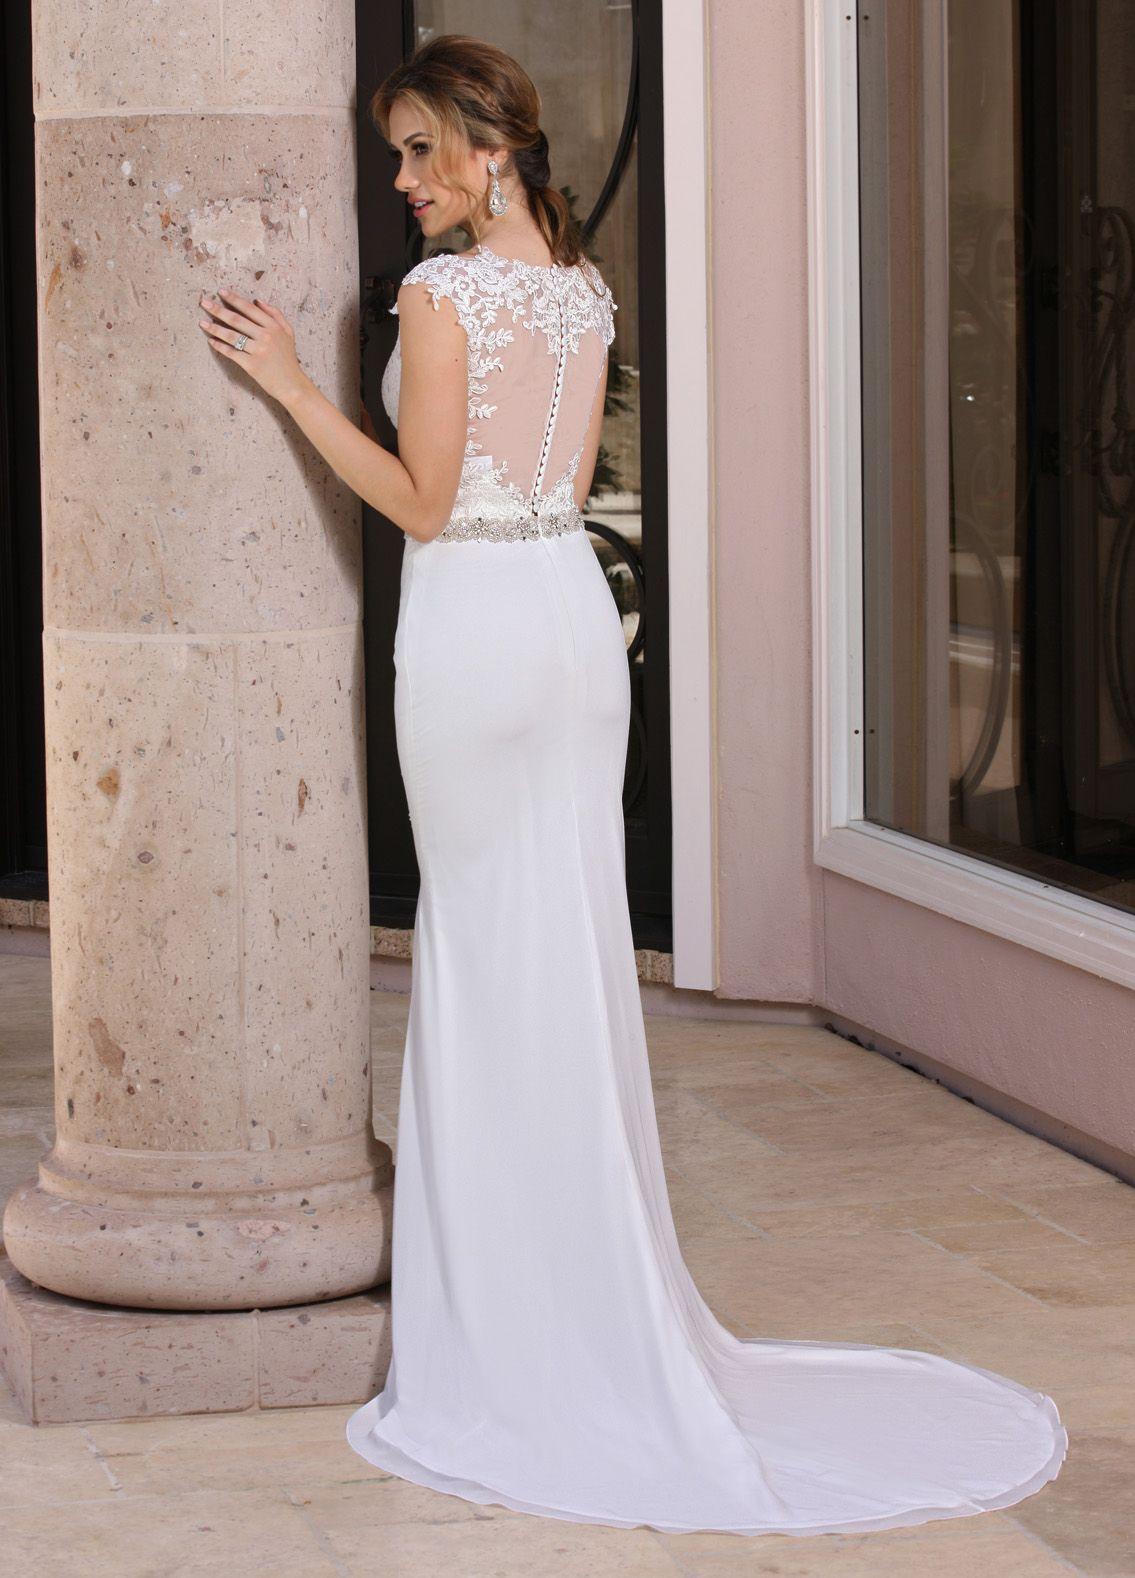 Back image davinci wedding gownsbridesmaid dressesq by davinci